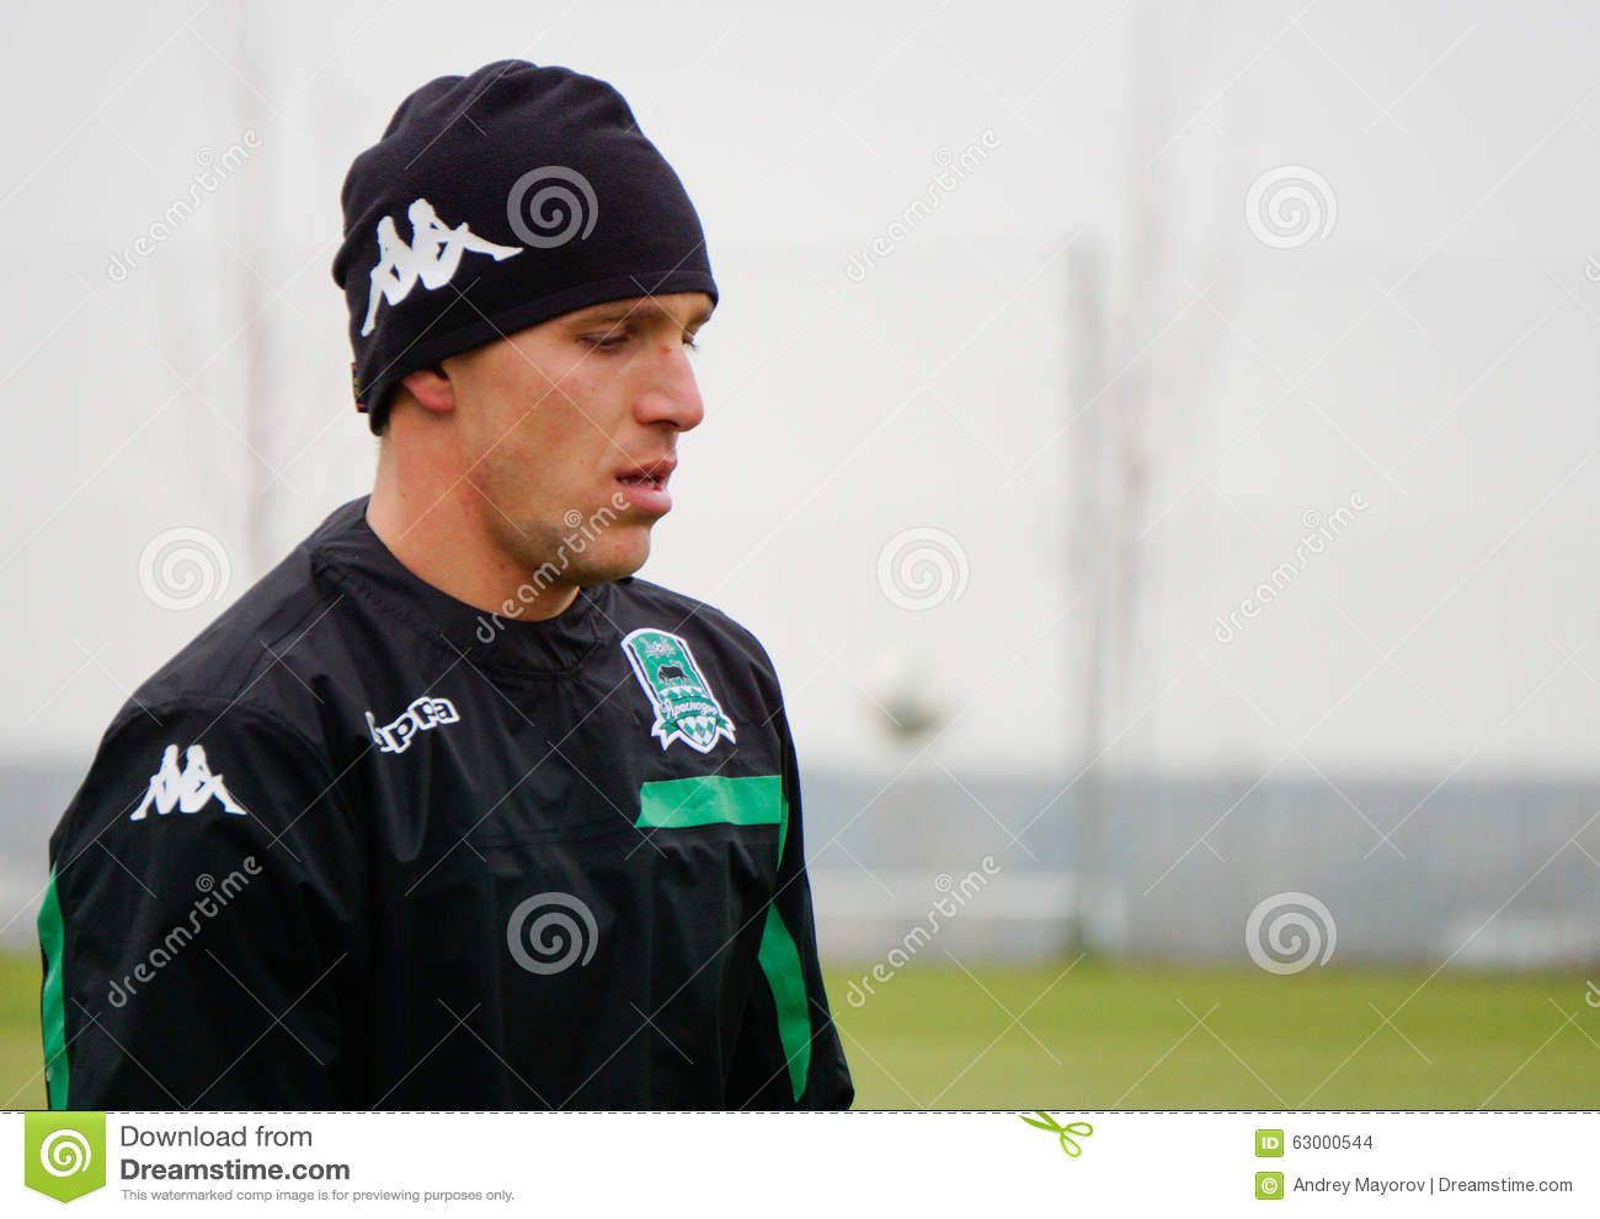 Midfielder of the football club Krasnodar